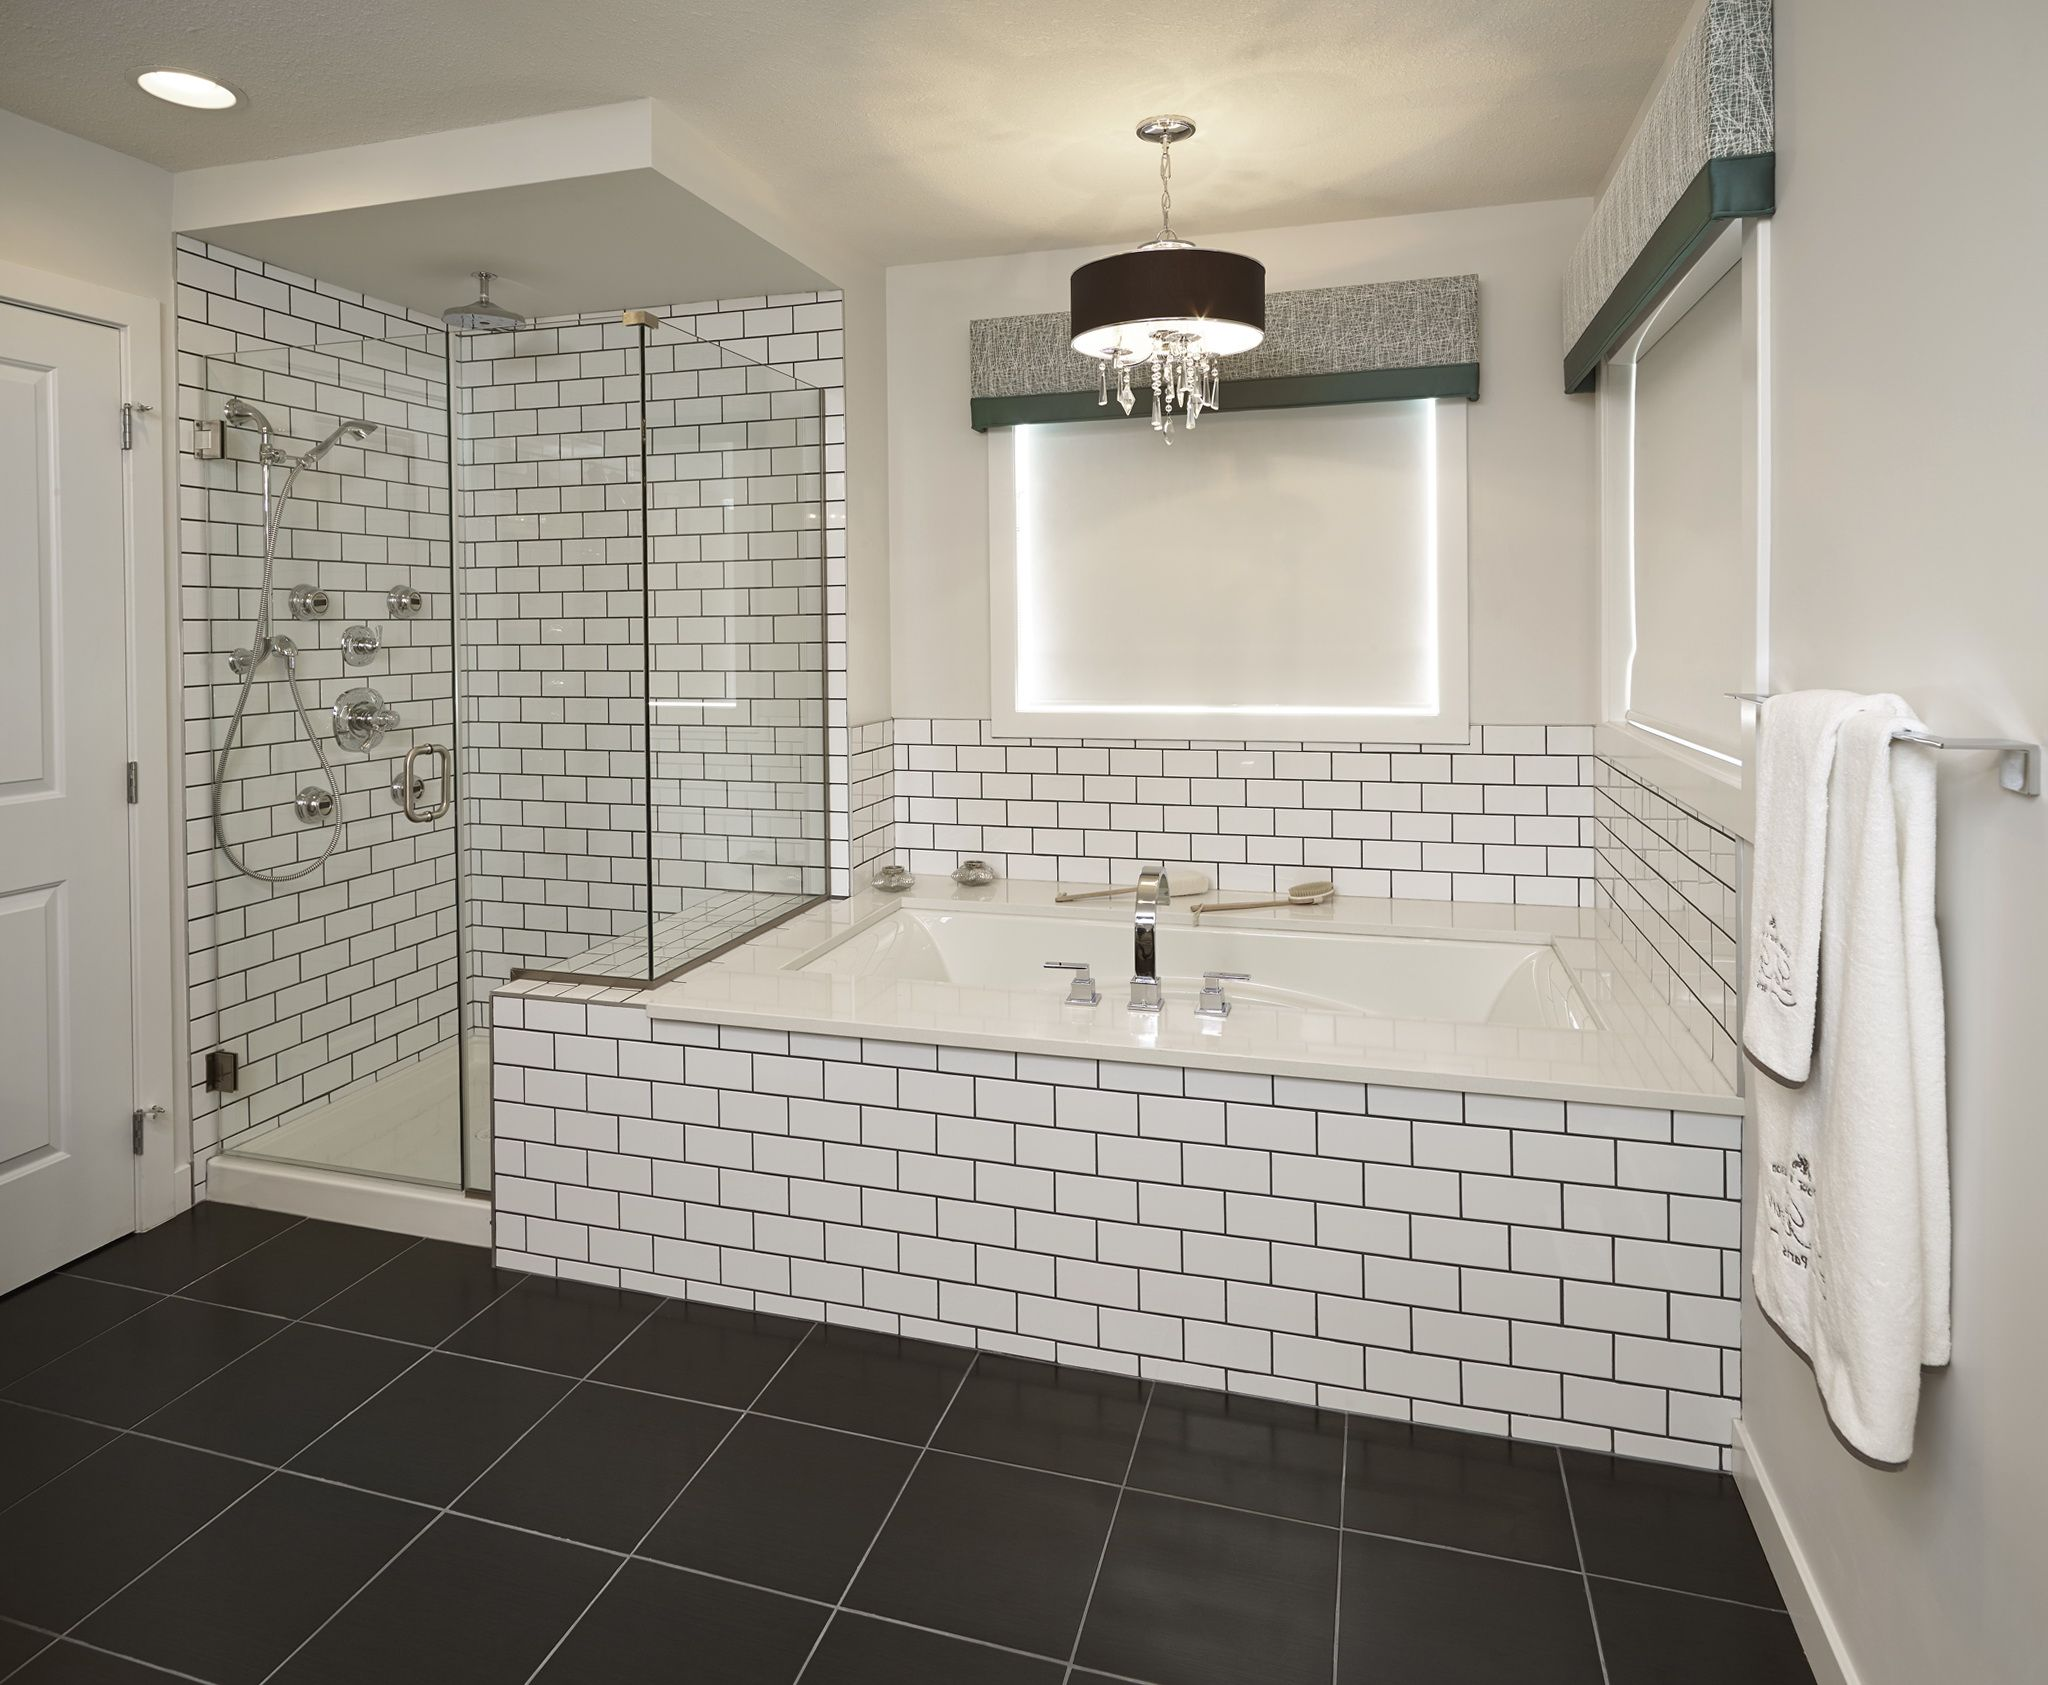 Subway tile bathroom black grout